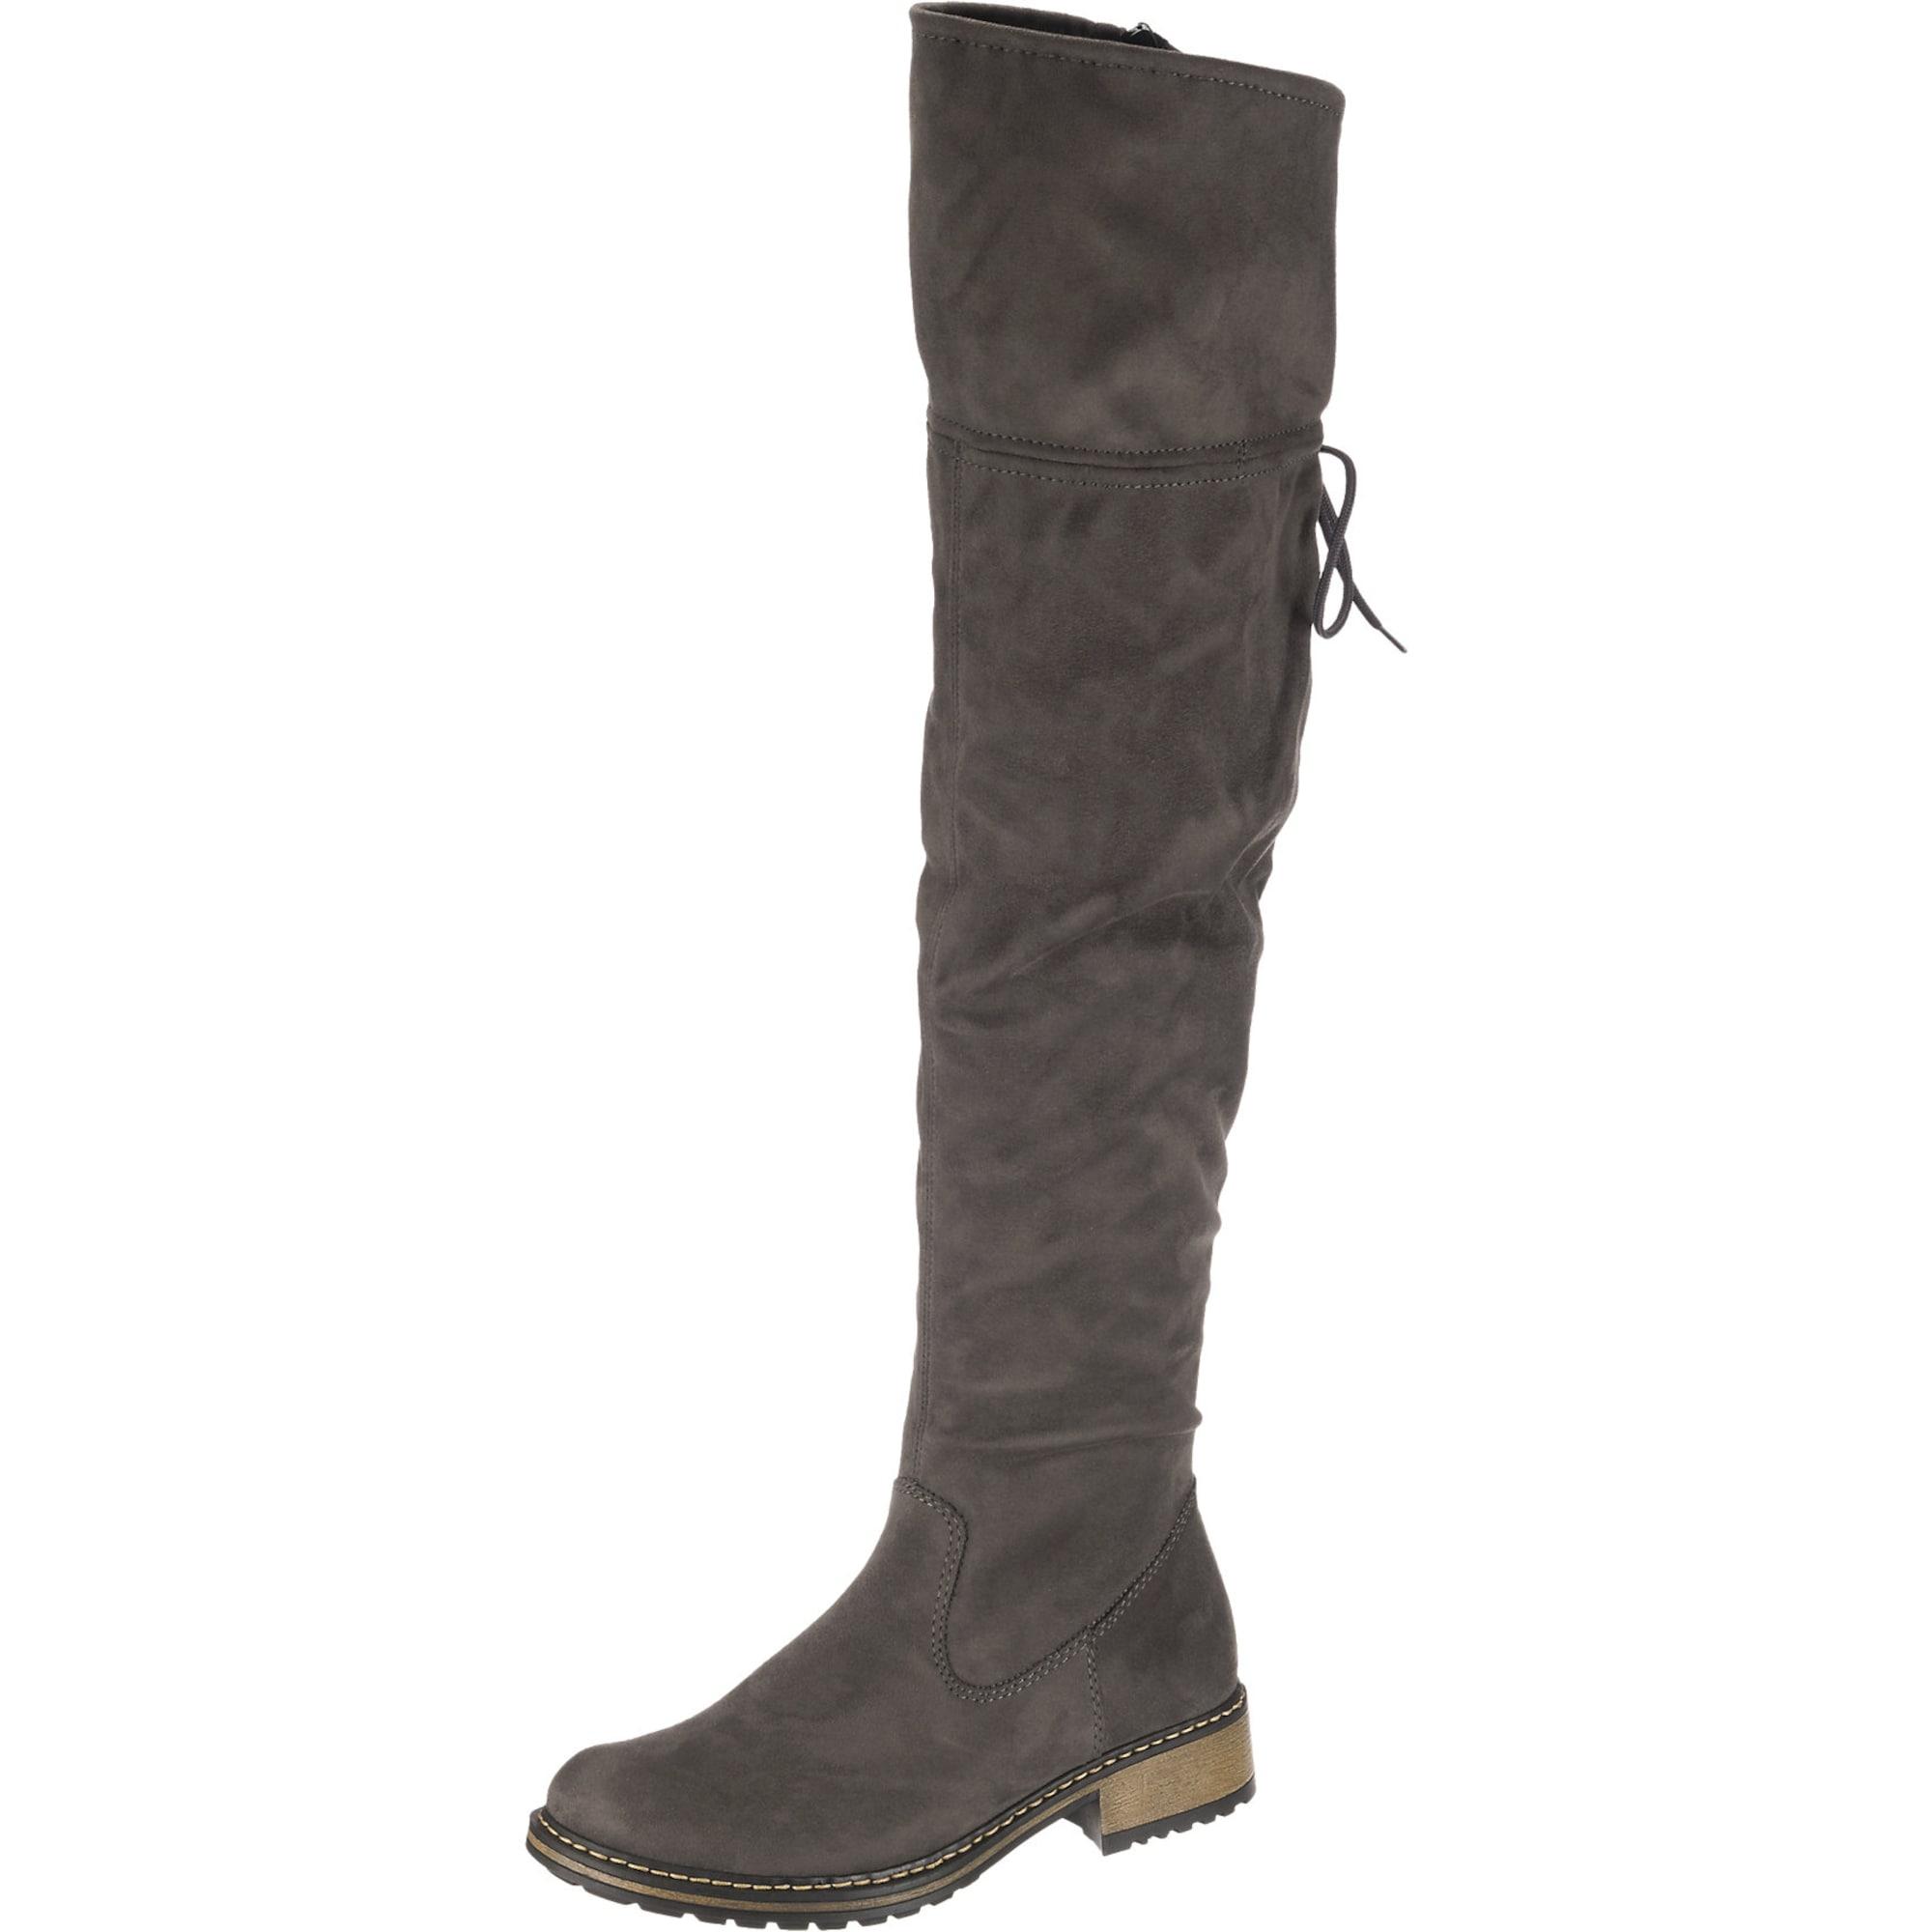 RIEKER, Dames Overknee laarzen, stone grey